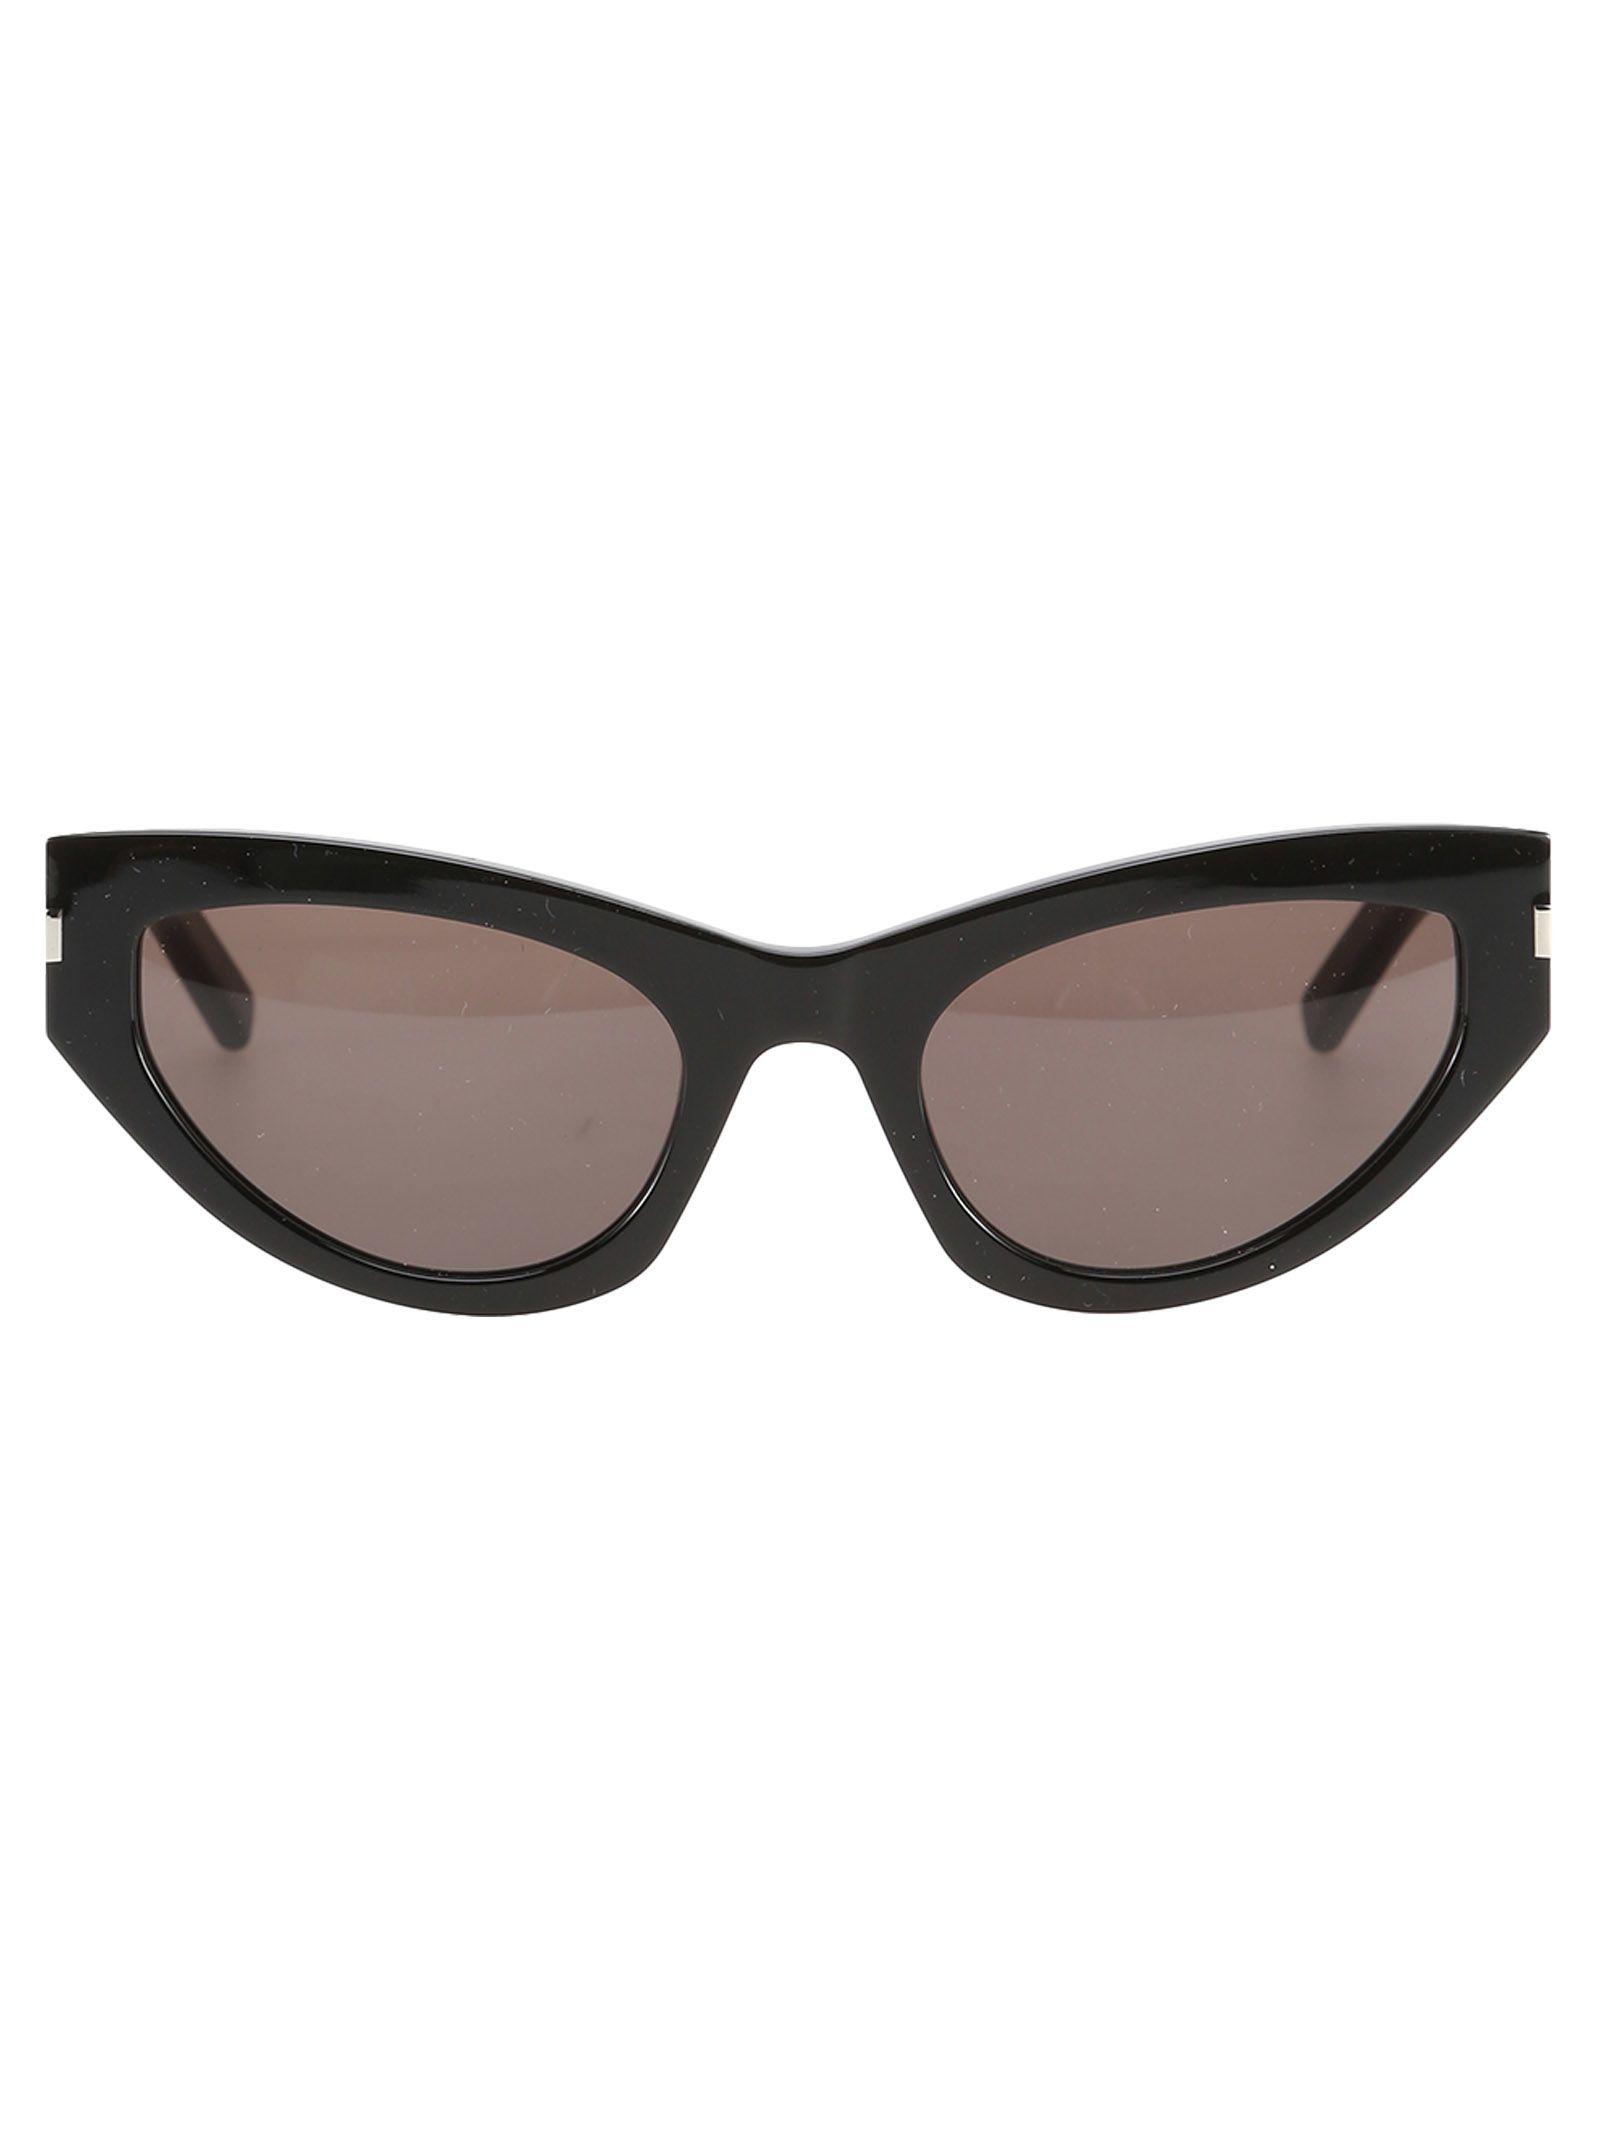 Saint Laurent Eyewear Cat Eye Sunglasses